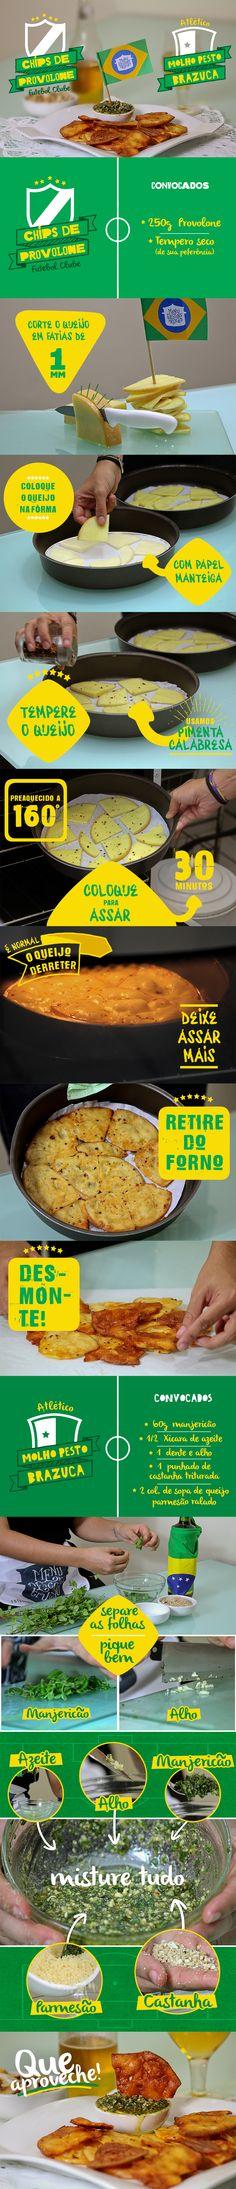 Chips de provolone & Molho pesto brazuca // Série #MenuNaCopa - Copa 2014